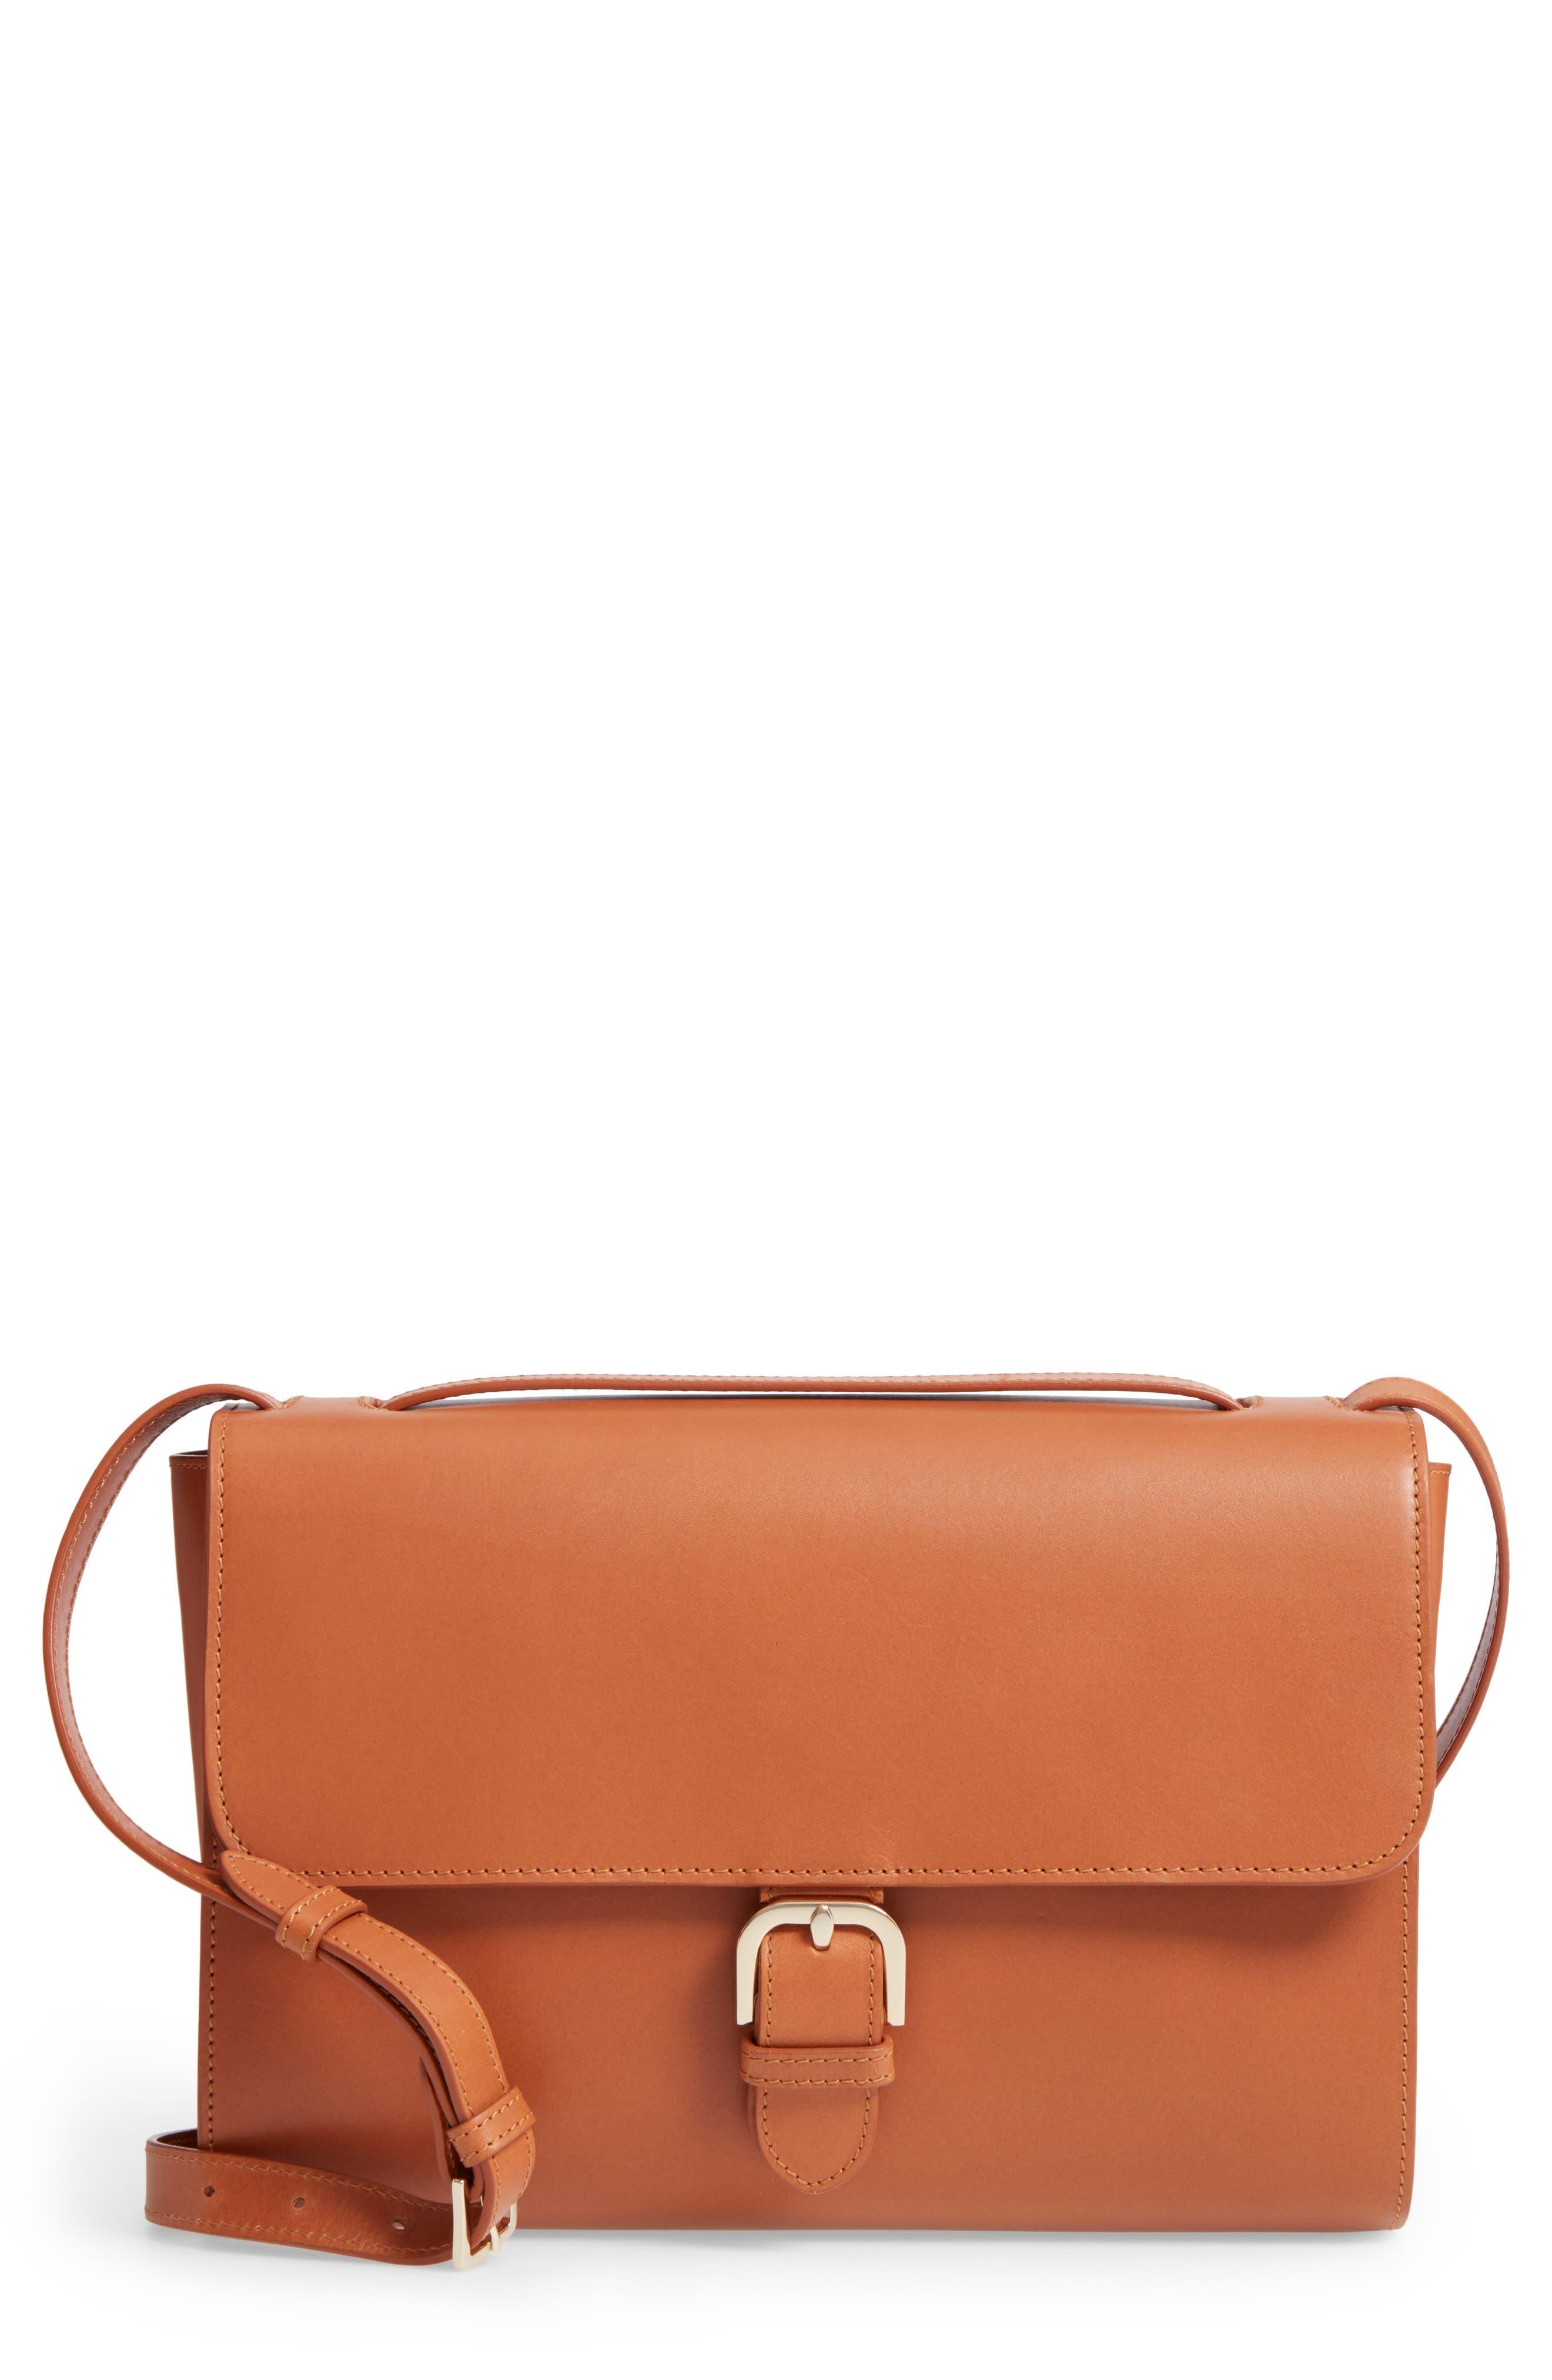 A.P.C. Katy Calfskin Leather Messenger Bag